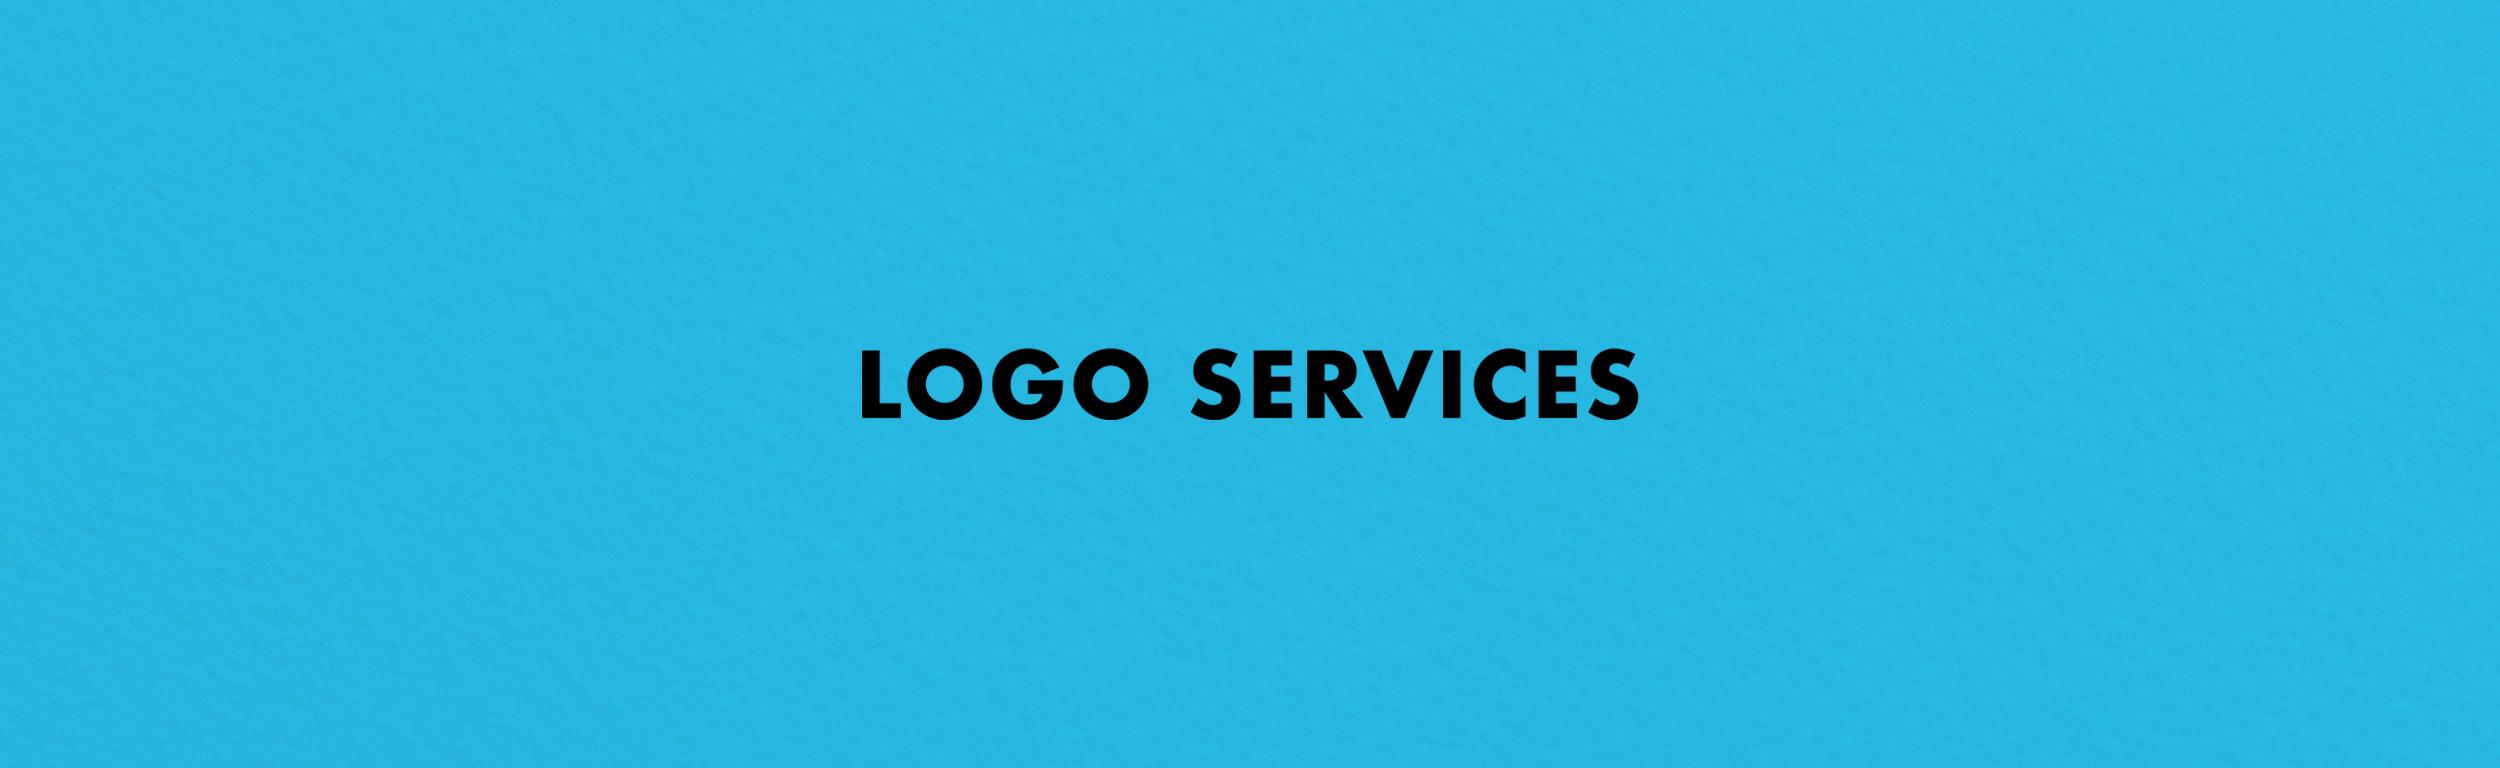 logoservices.jpg